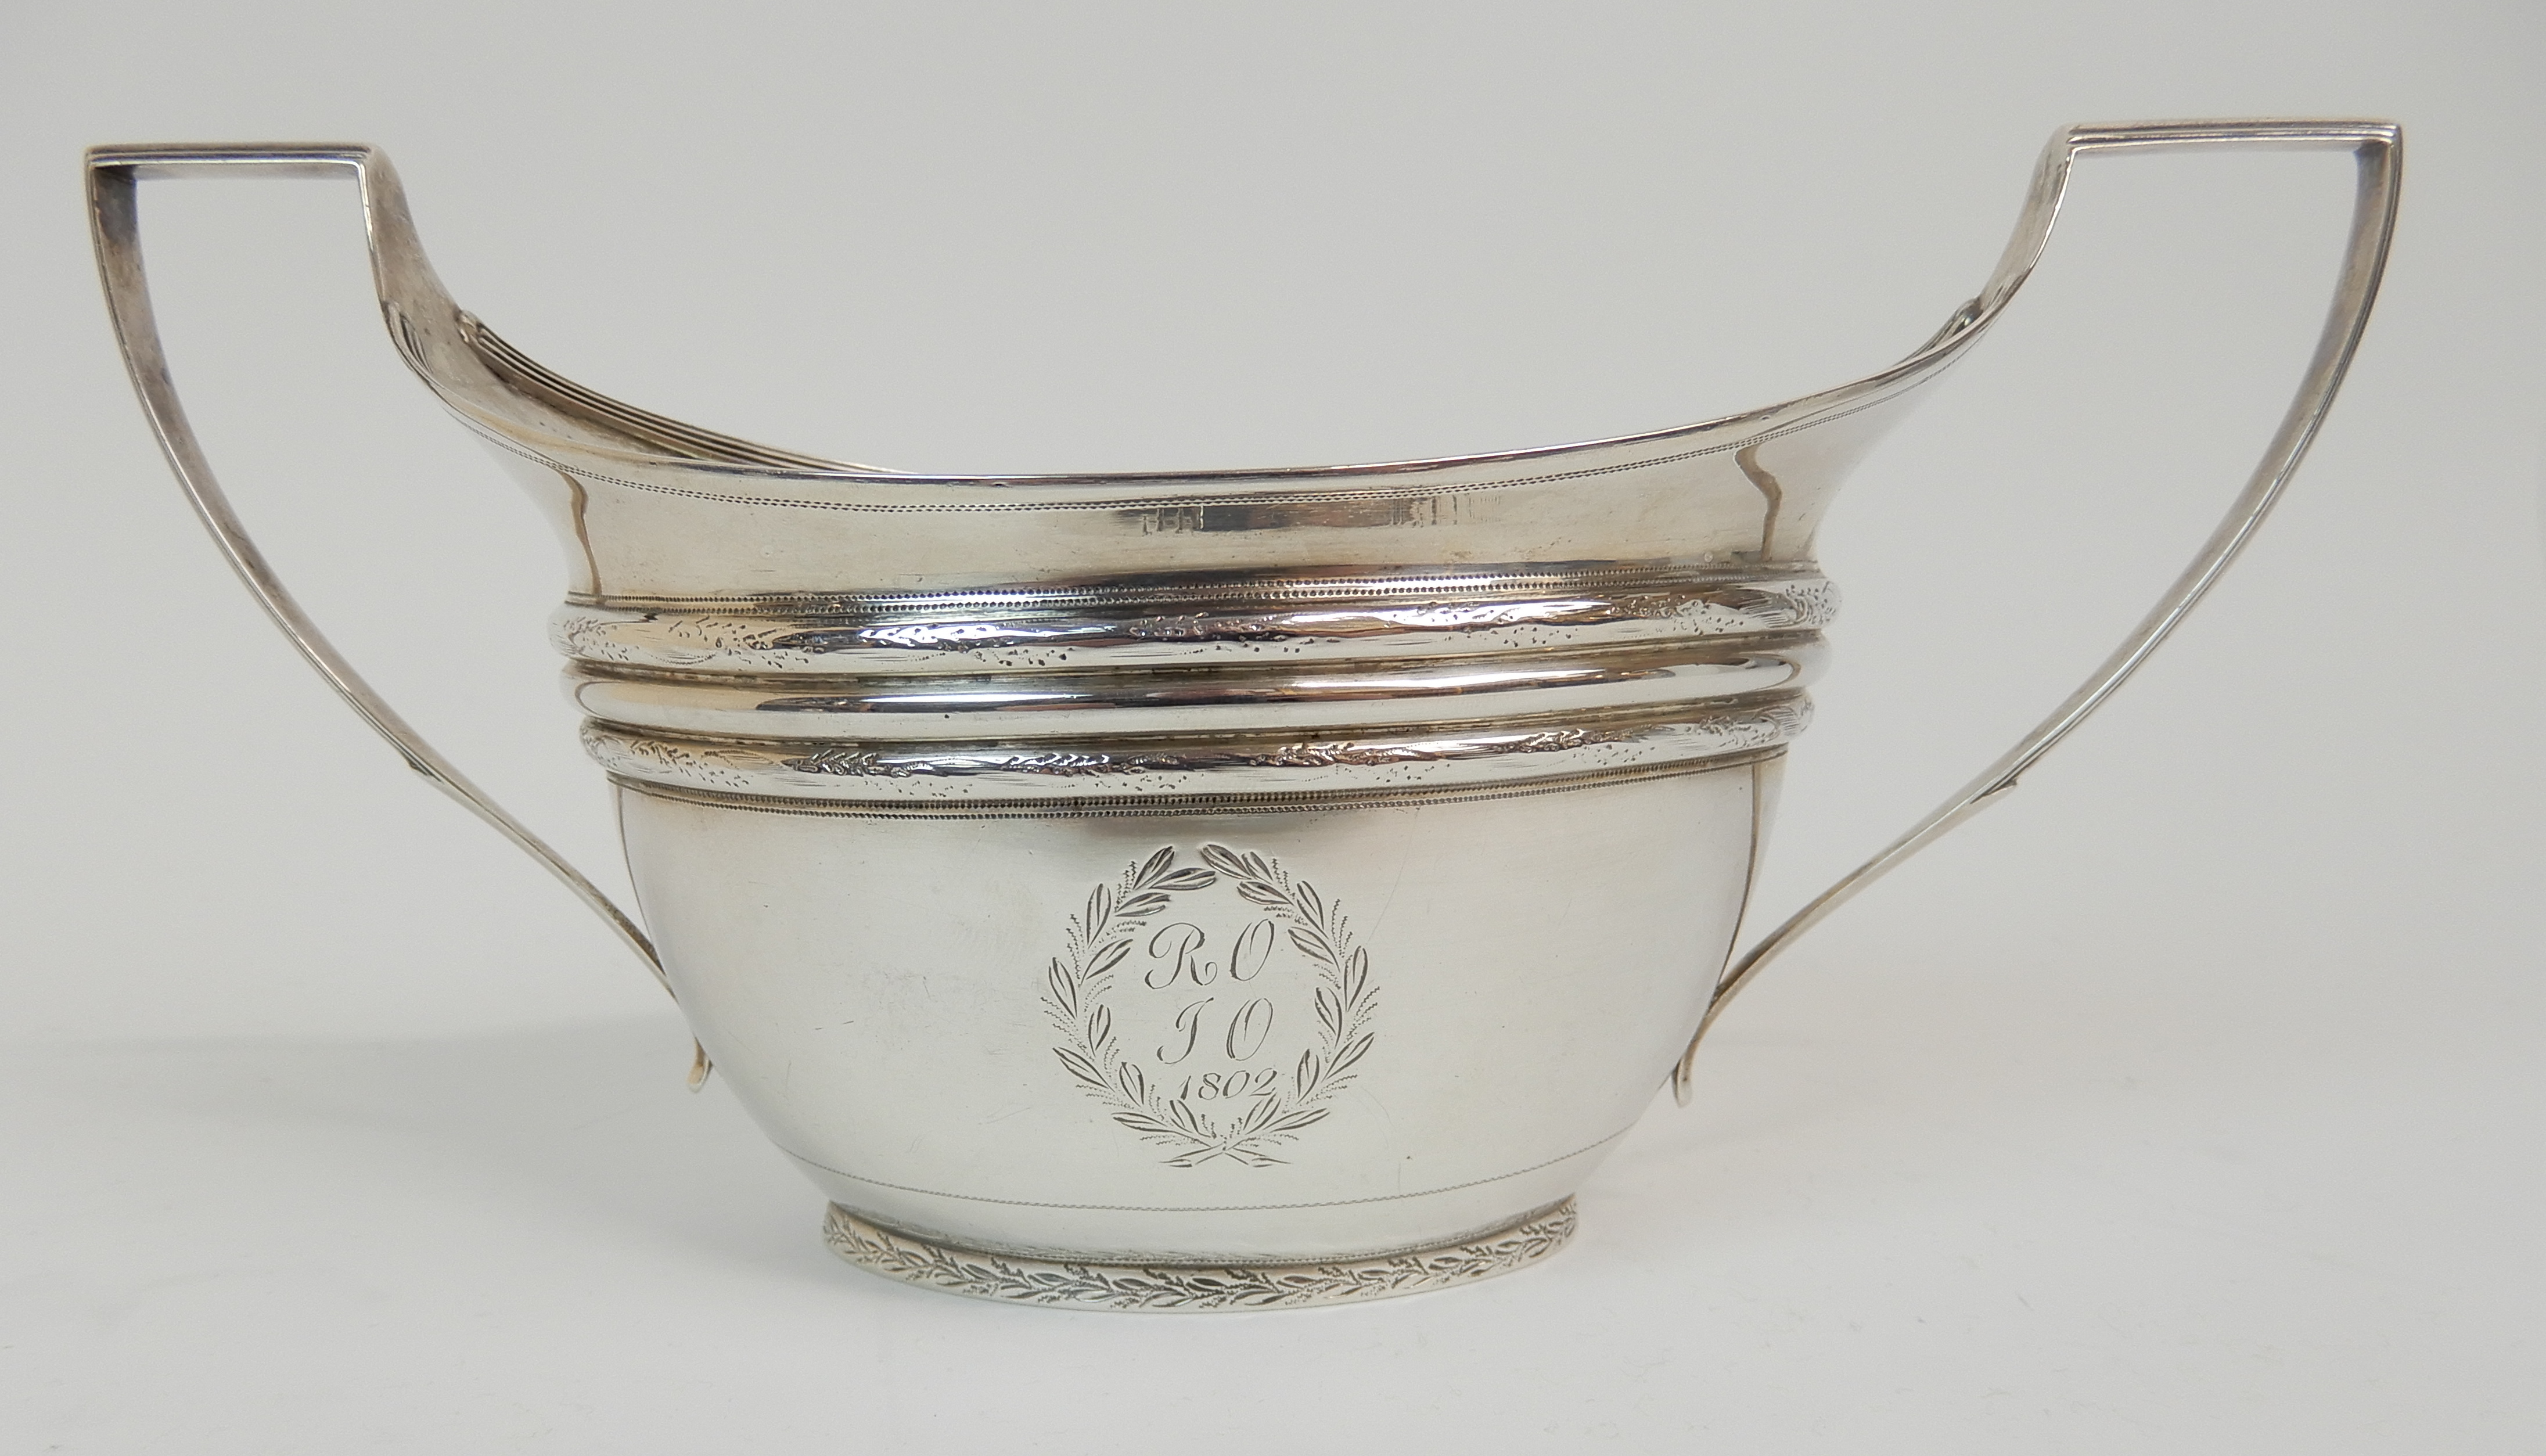 Lot 125 - A GEORGE III SILVER FOUR PIECE TEA SERVICE maker's marks JD, Edinburgh 1802, comprising teapot